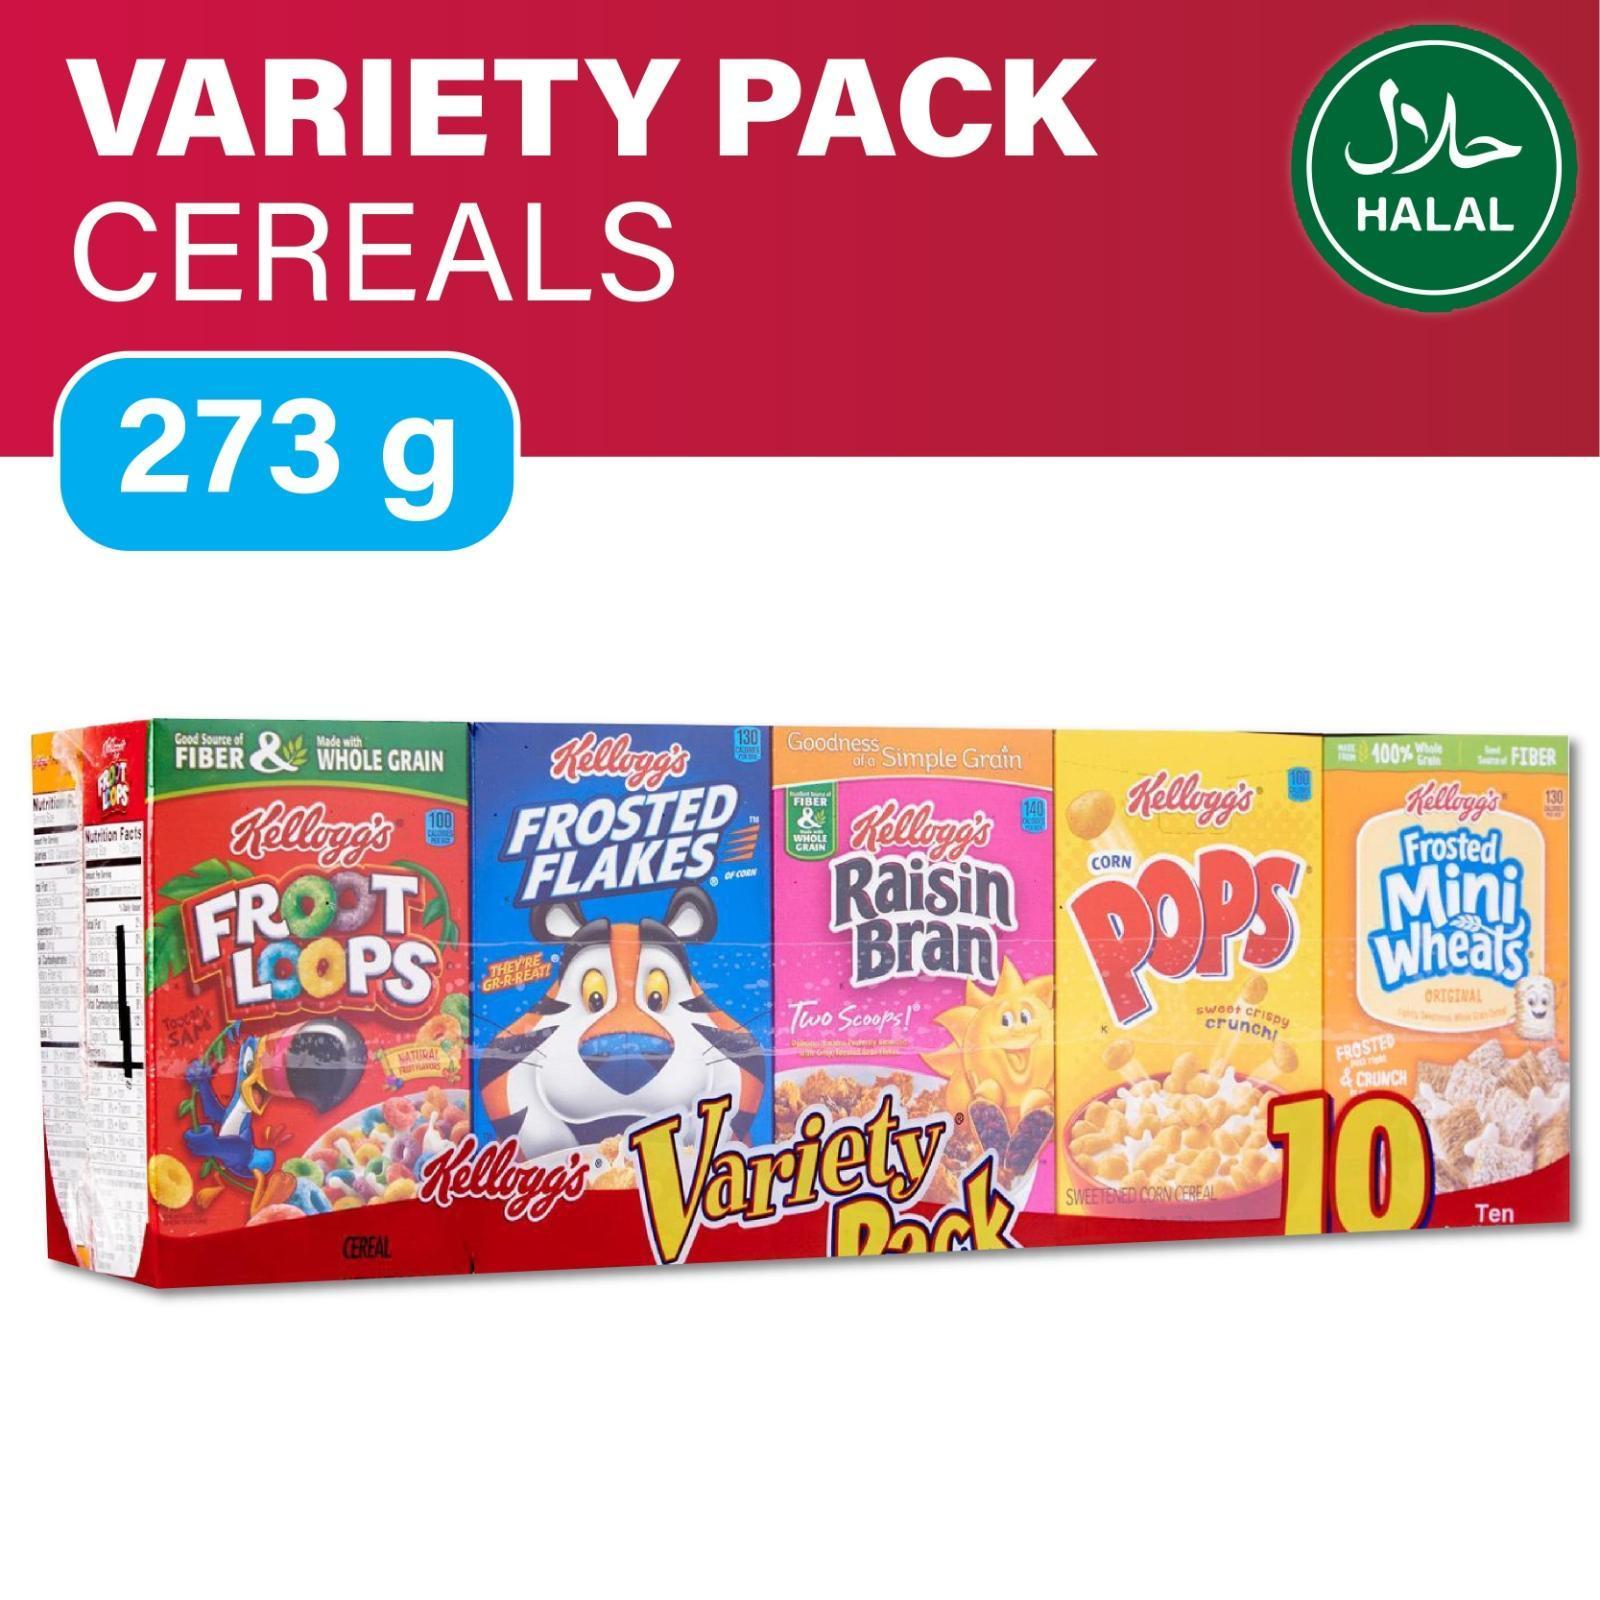 Kellogg's Variety Pack 10 boxes